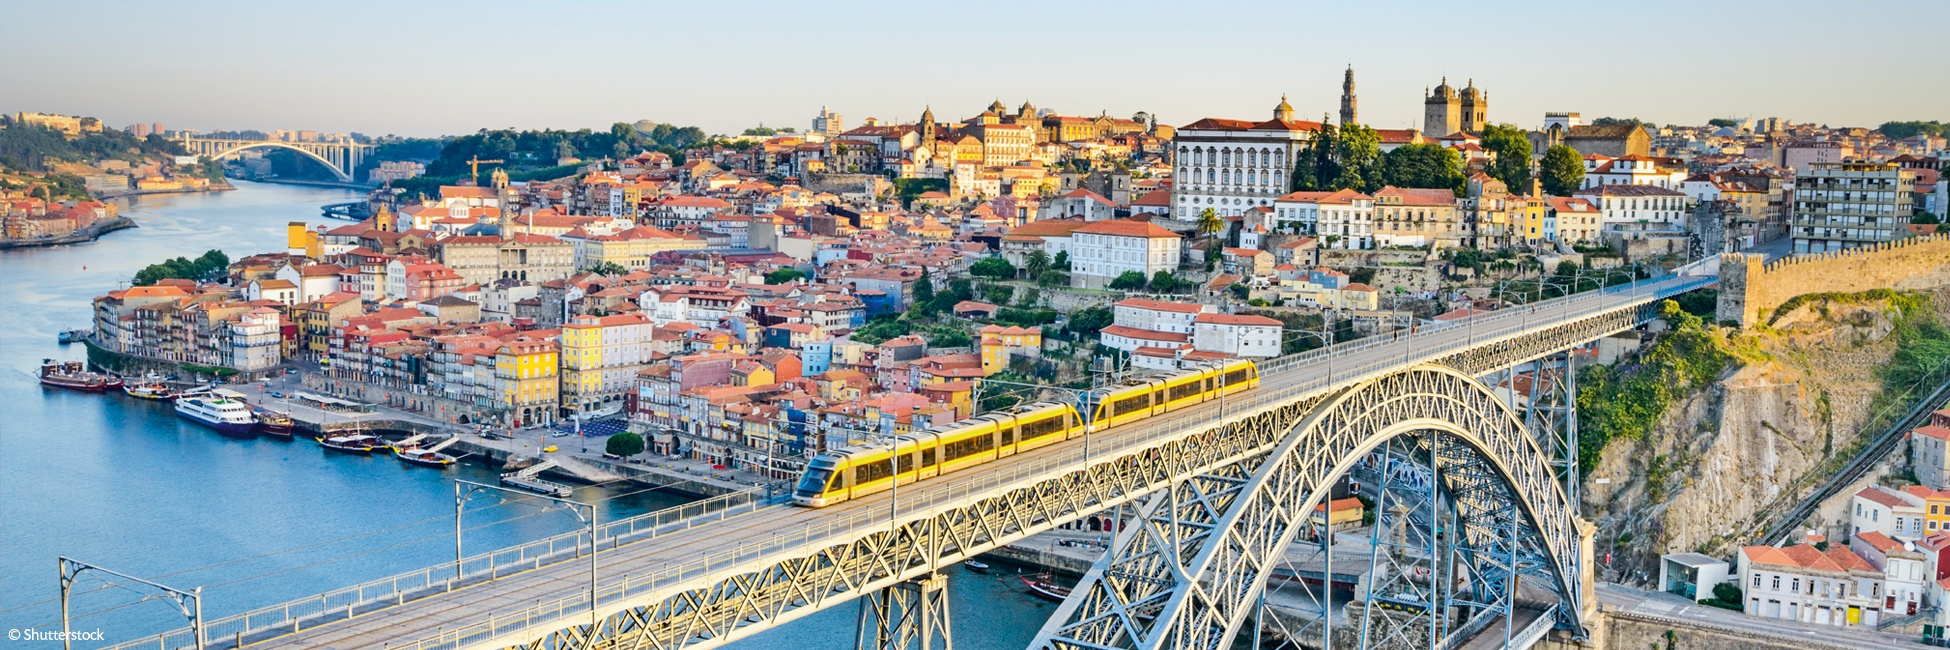 portugal-douro-porto-croisieurope-slider-pof-ete-shutterstock